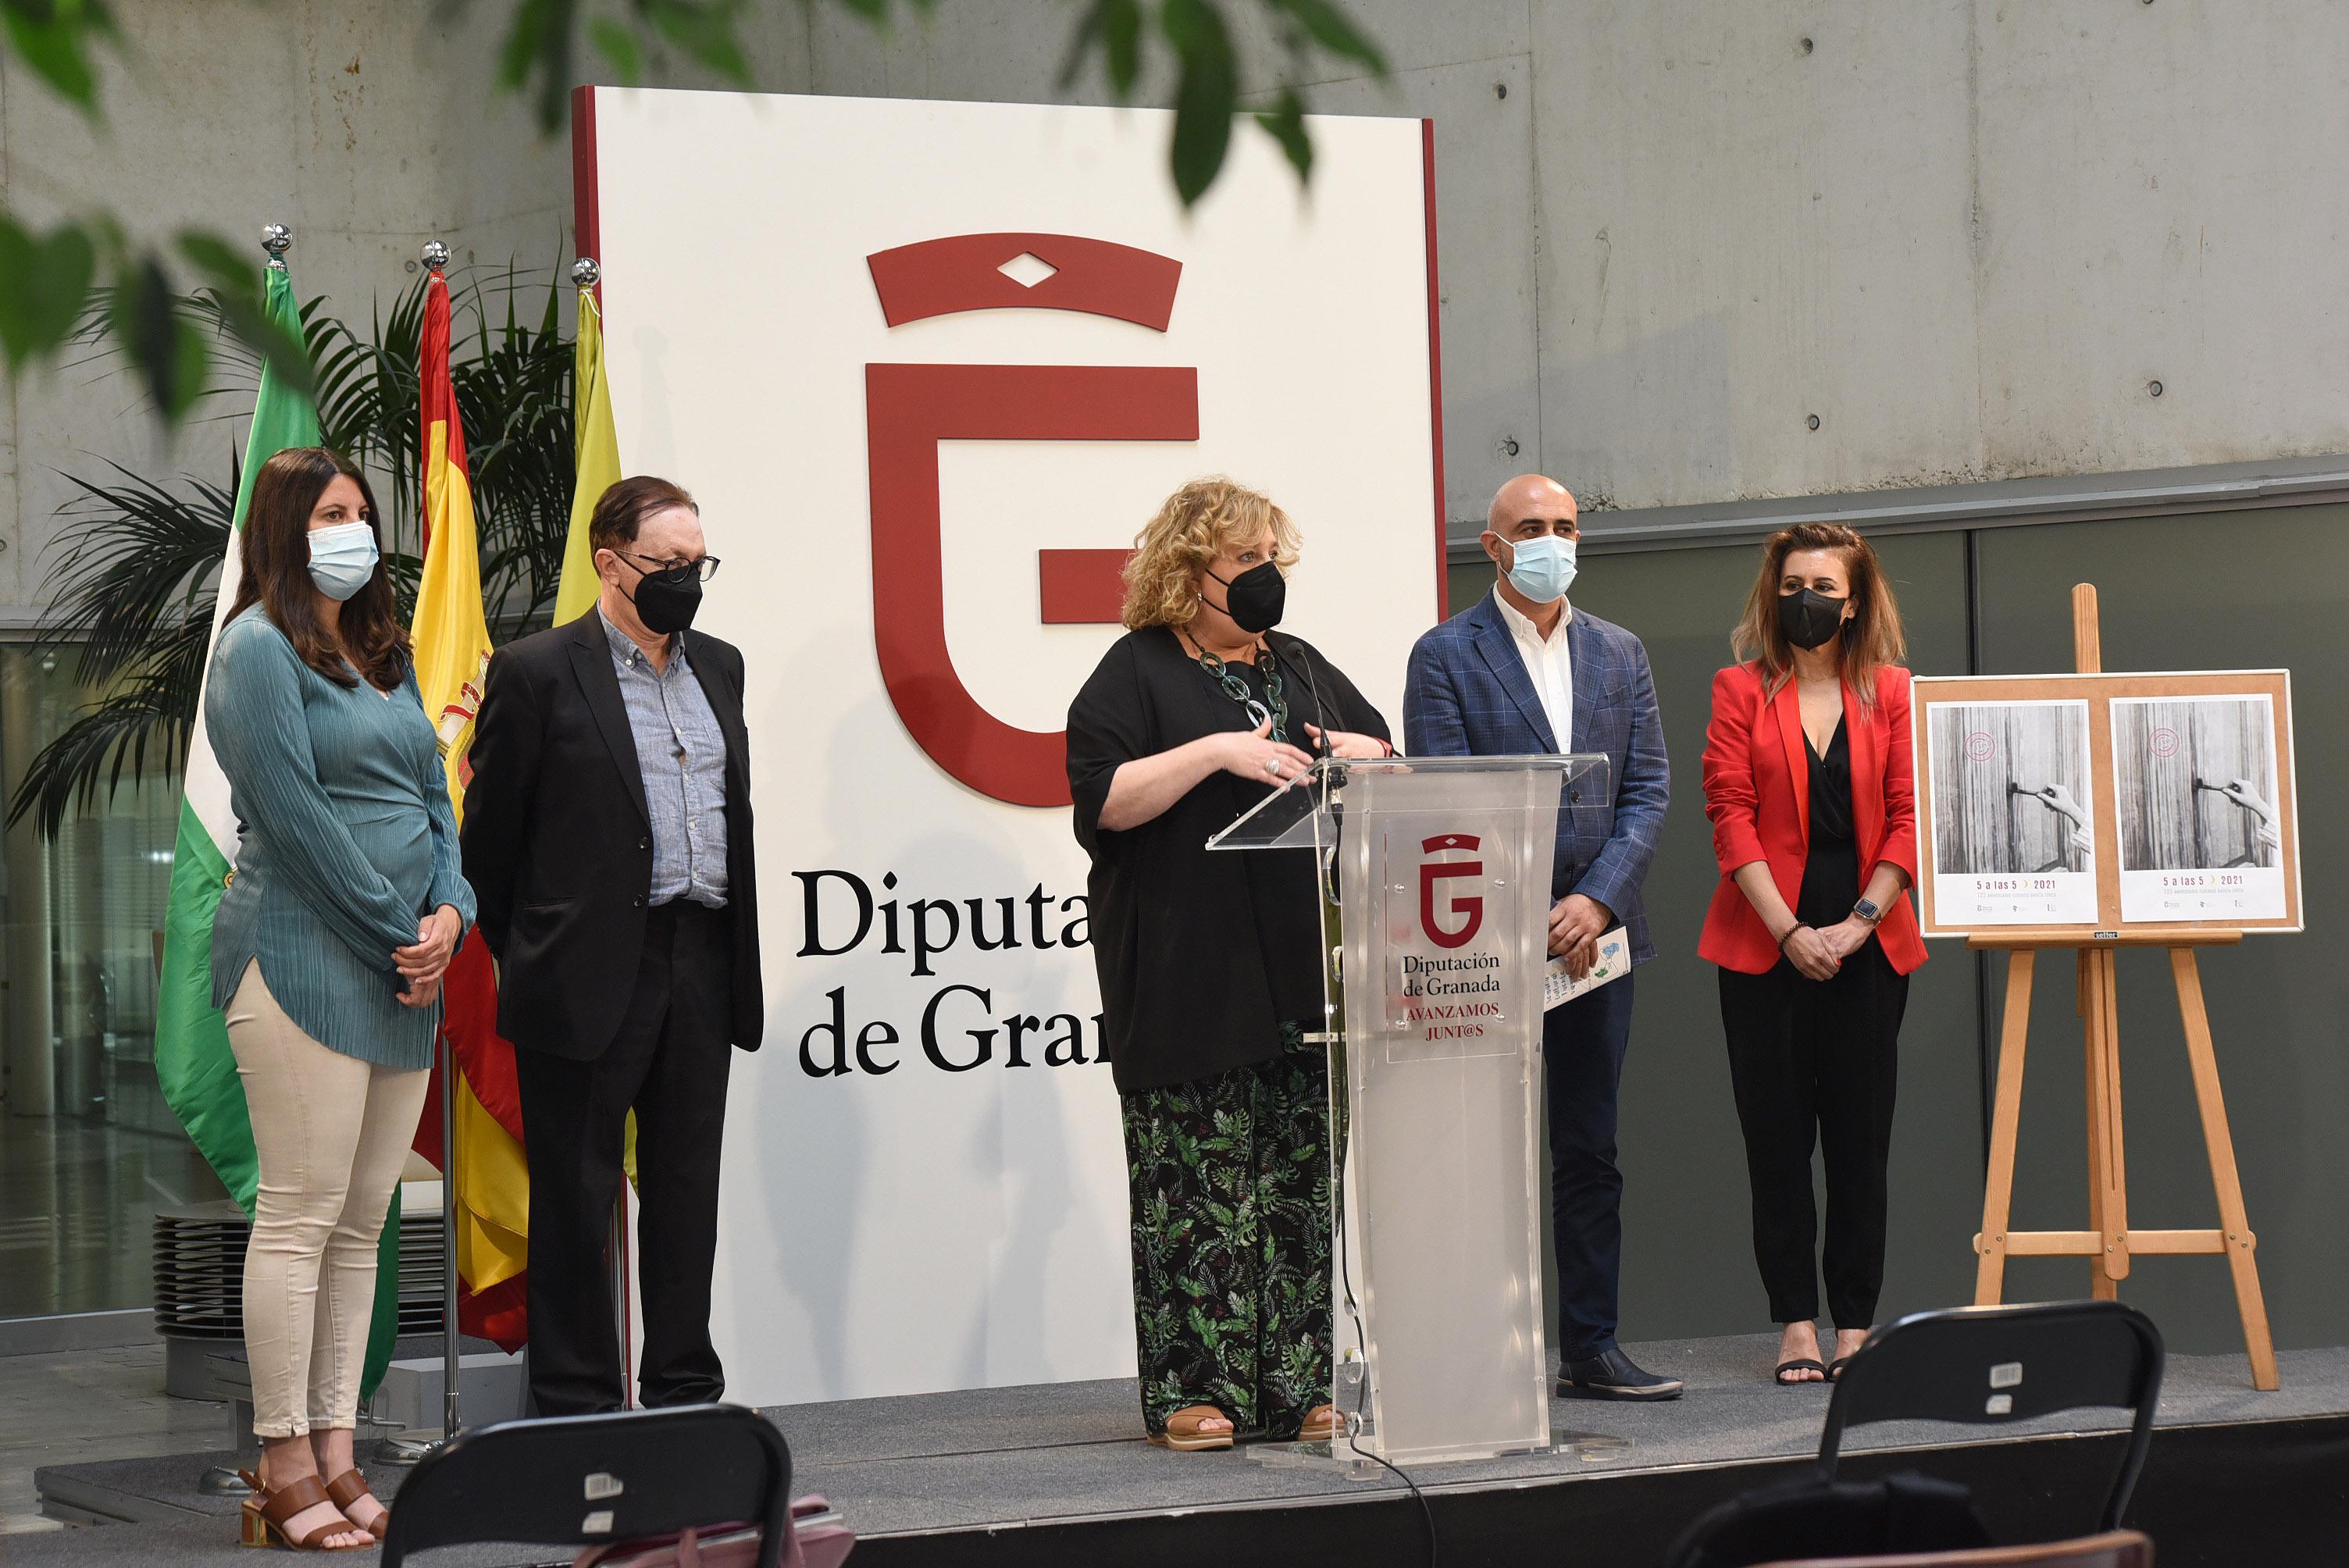 Diputación otorga el Pozo de Plata a la bailaora y coreógrafa Eva Yerbabuena